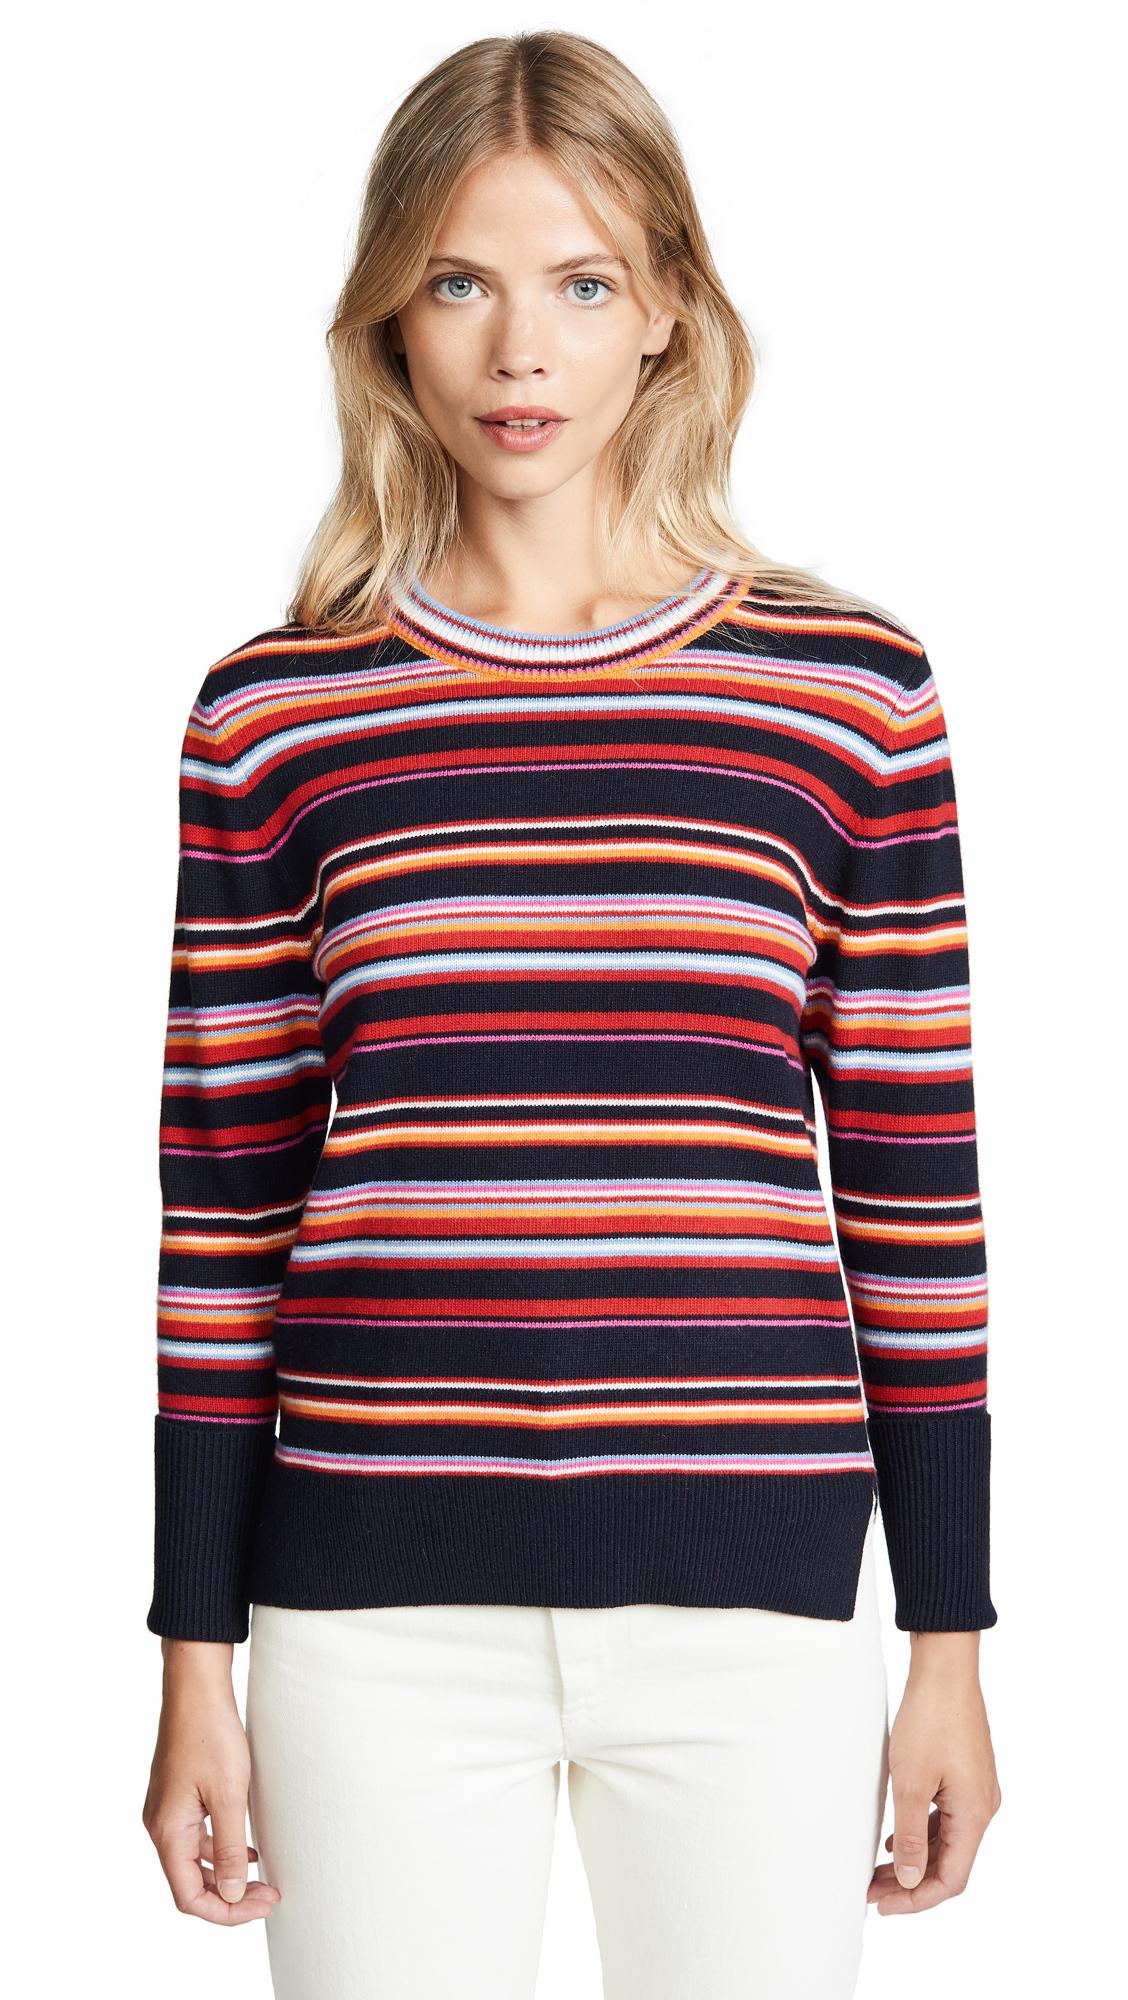 Tory Burch Kit Sweater - Tory Navy